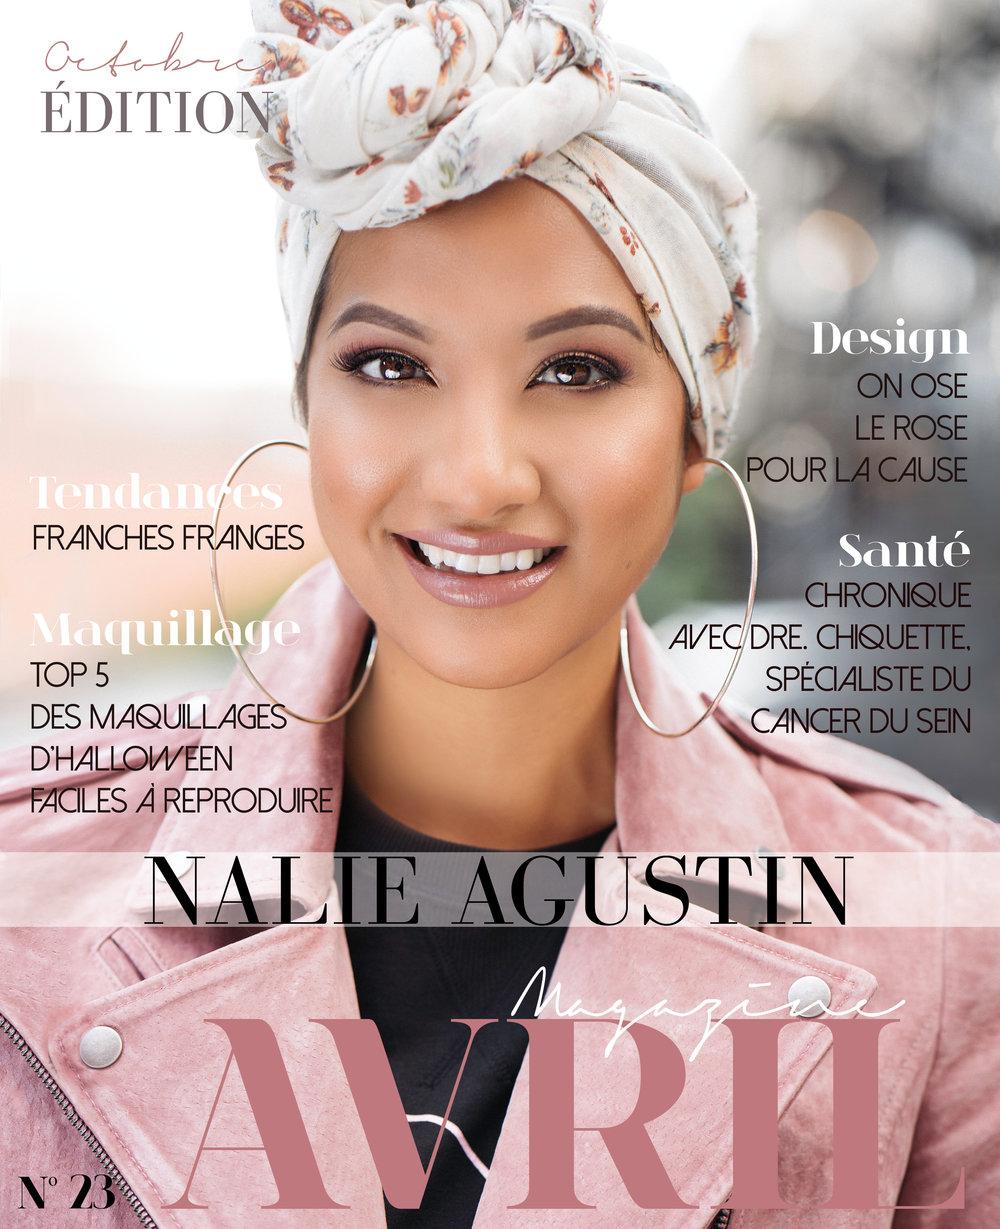 Cover-nalie-octobre.jpg